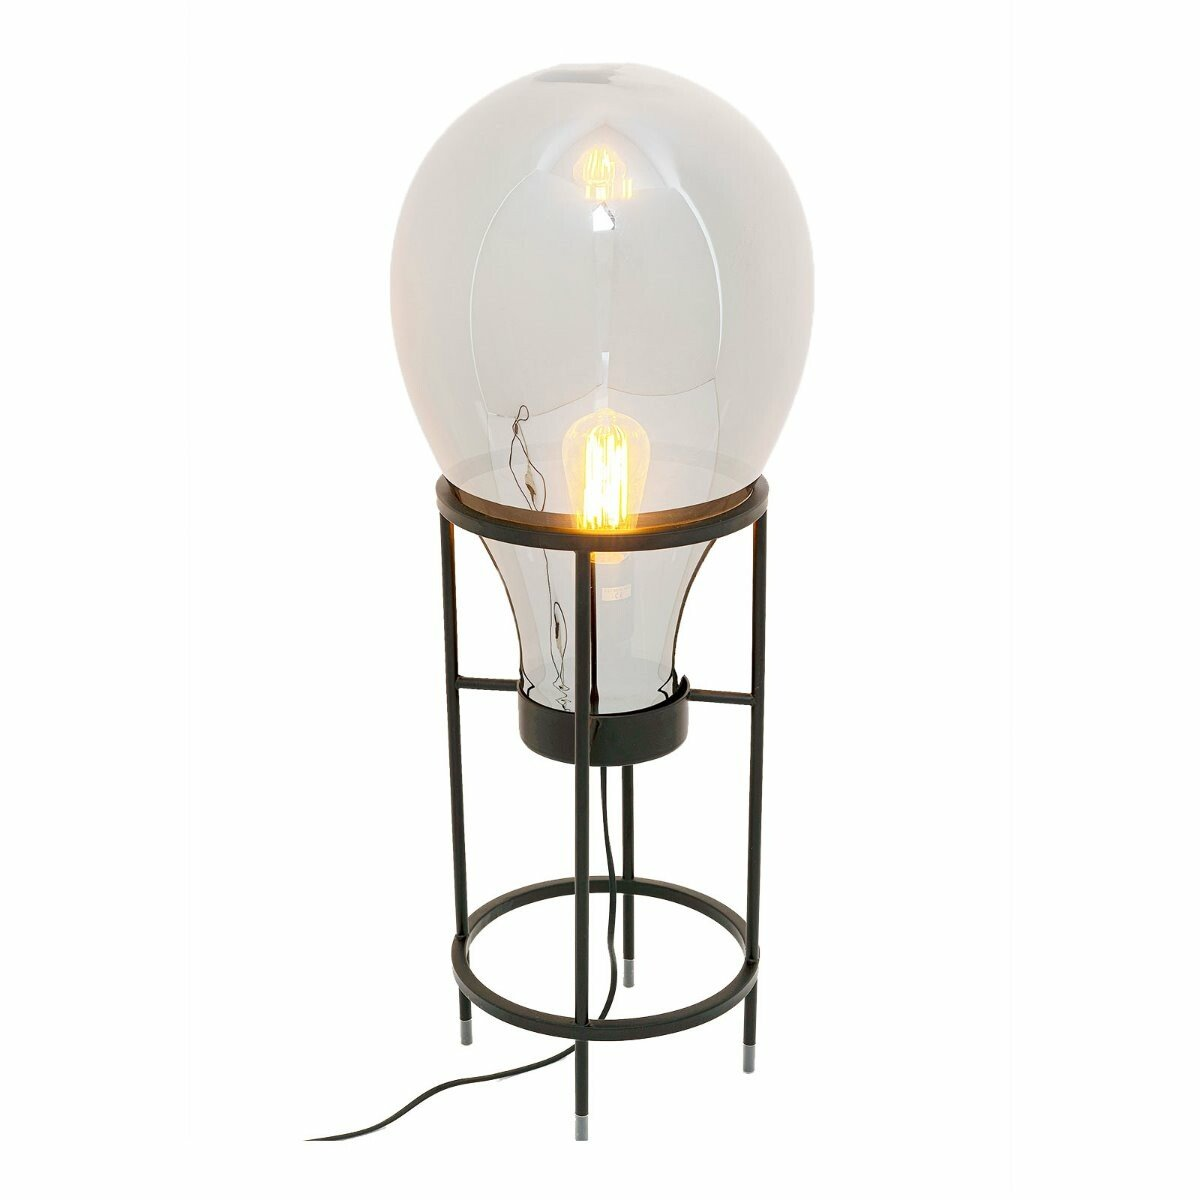 Kare Design tafellamp pear frame zwart 78 x 30 x 30